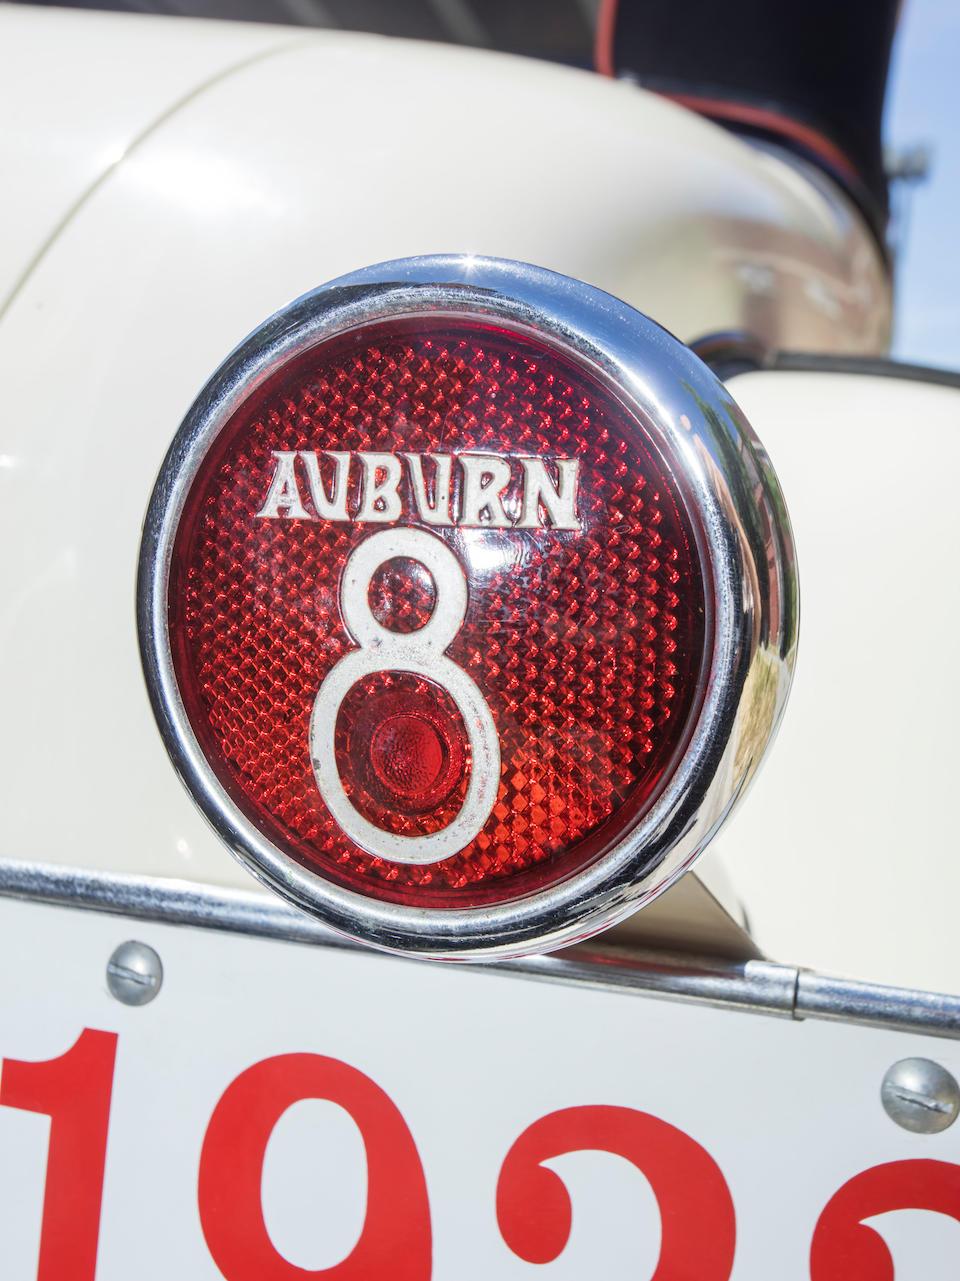 <b>1933 Auburn 8-105 Cabriolet</b><br />Chassis no. 1145 F <br />Engine no. GC 471